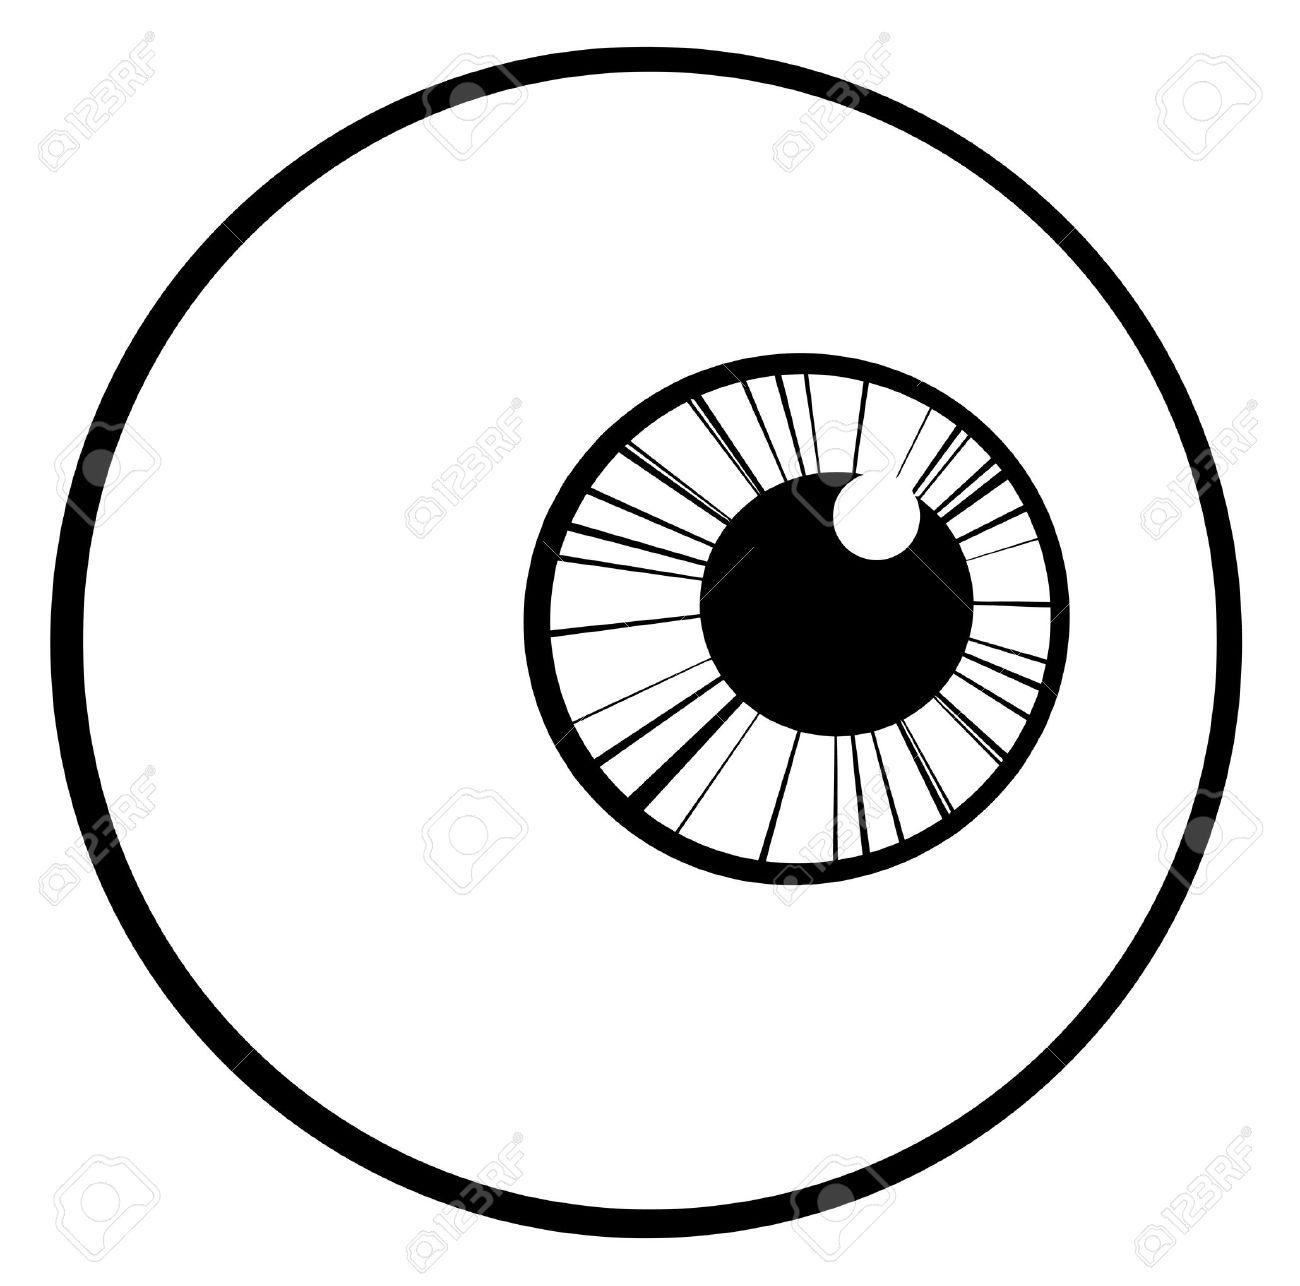 outlined eye ball royalty free cliparts vectors and stock rh 123rf com eyeball vector free download cartoon eyeball vector